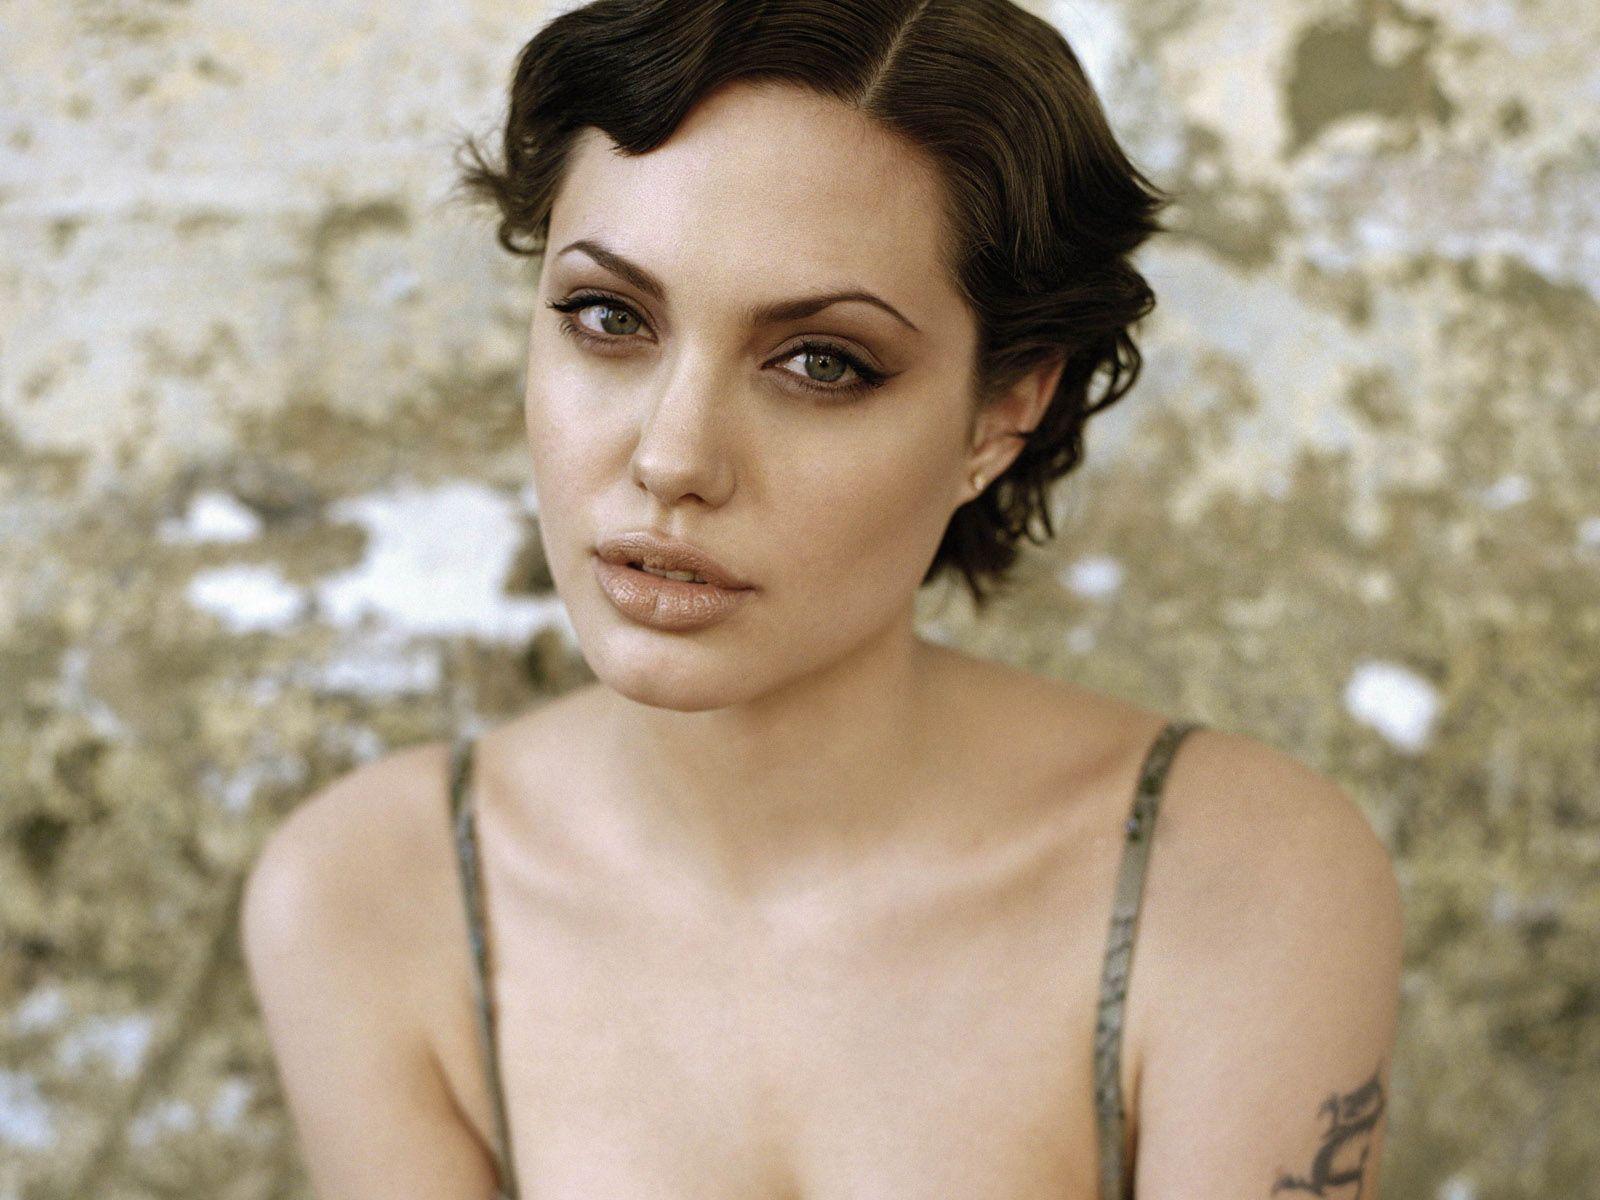 Celebrity Hairstyle Angelina Jolie Short Hairstyles Angelina Jolie Short Hair Short Hair Styles Angelina Jolie Hair